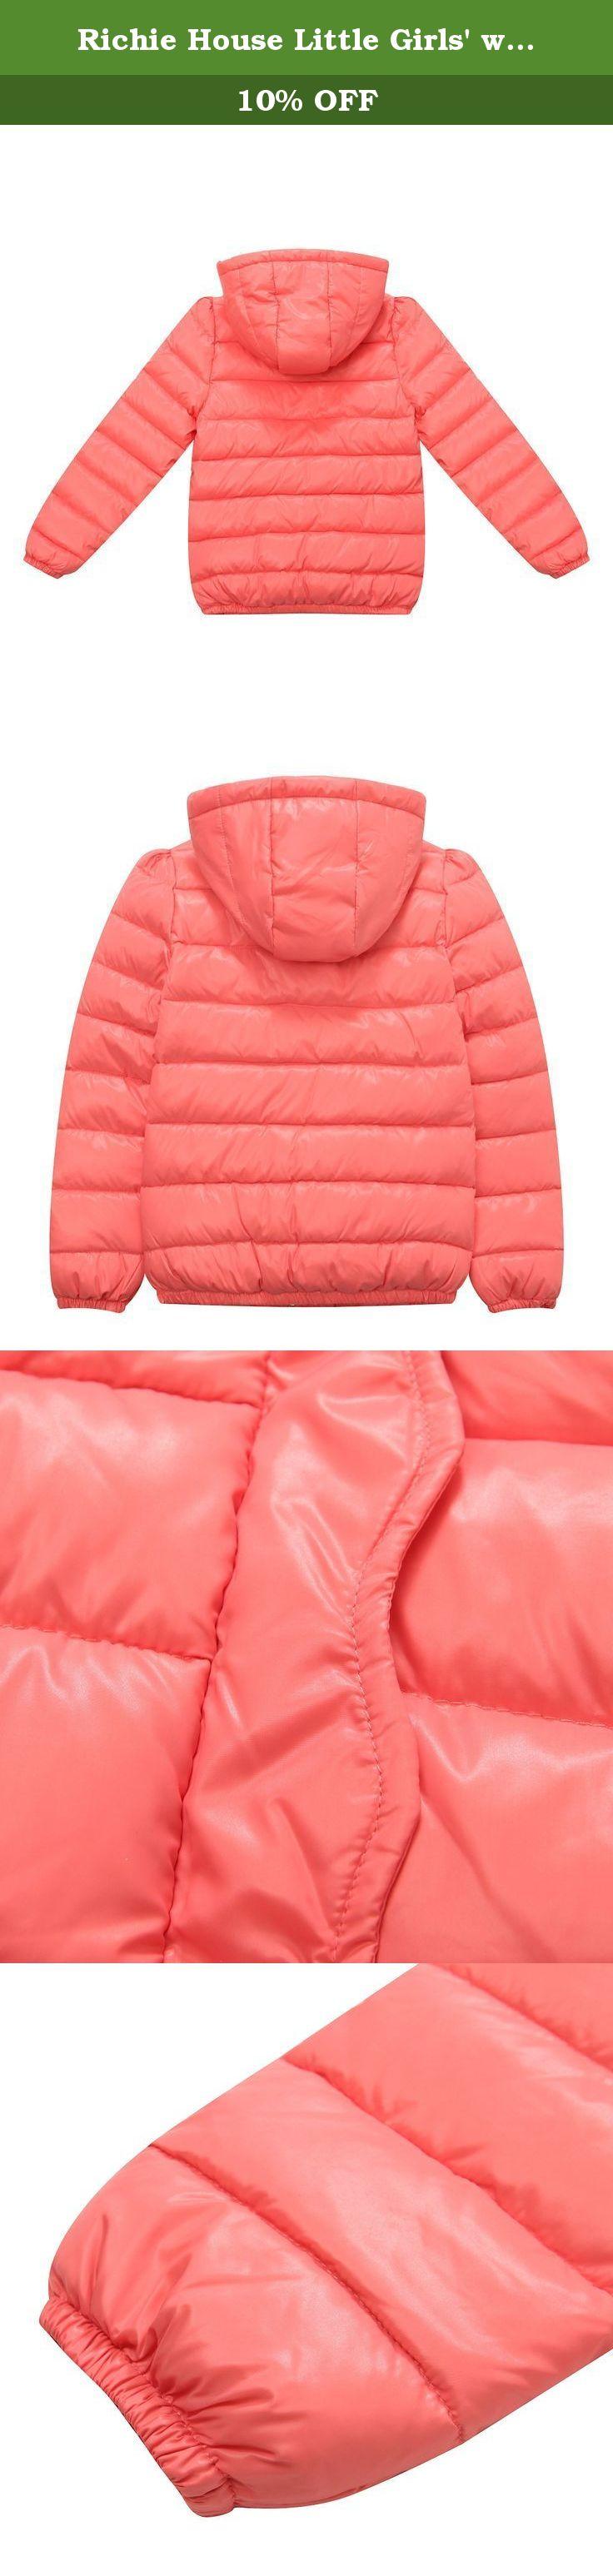 ce48ac68e1f8 Richie House Little Girls  winter padding jacket with ruffled p ...